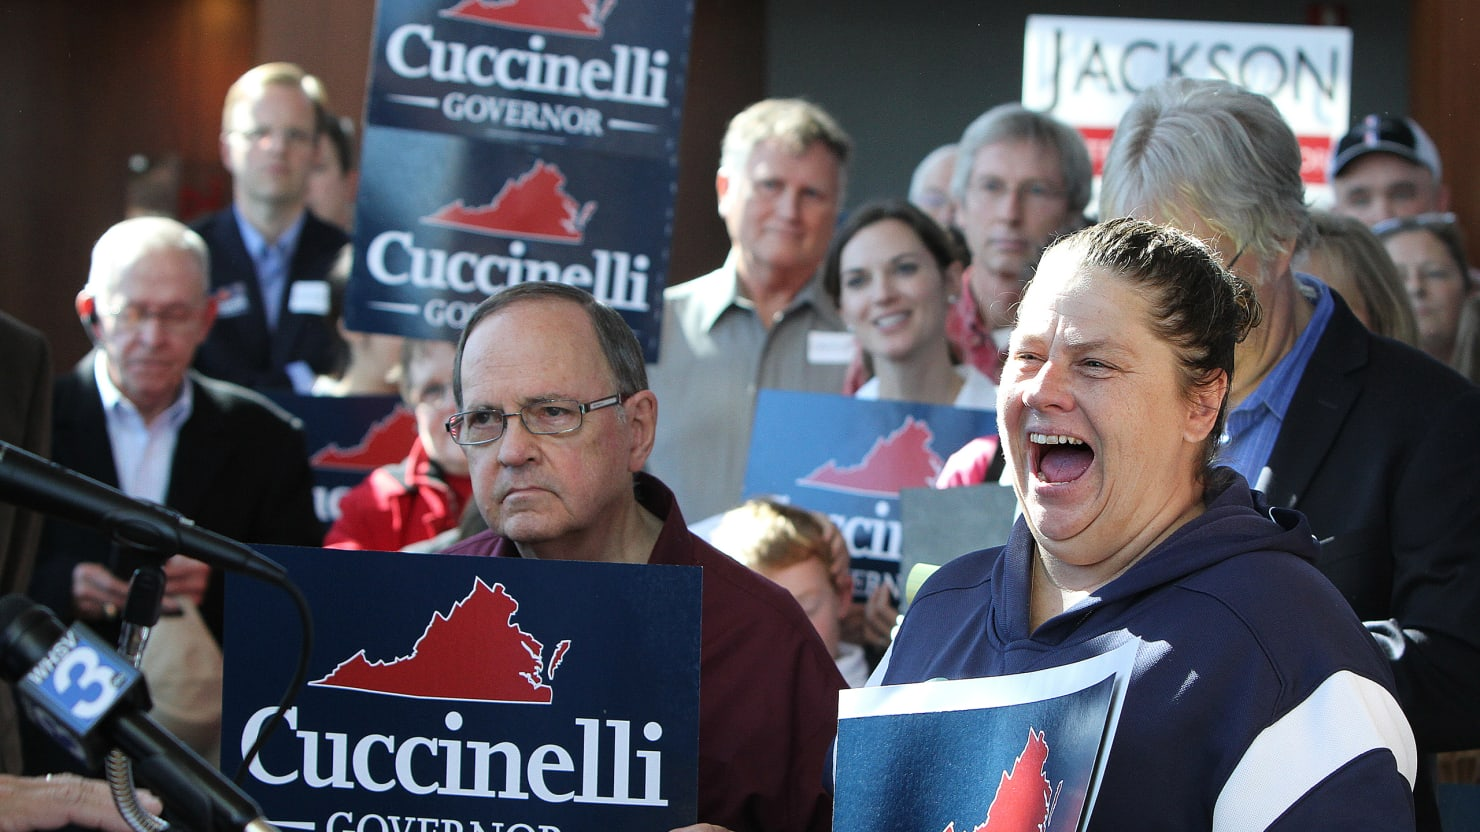 The Virginia Gubernatorial Race's Recipe for America